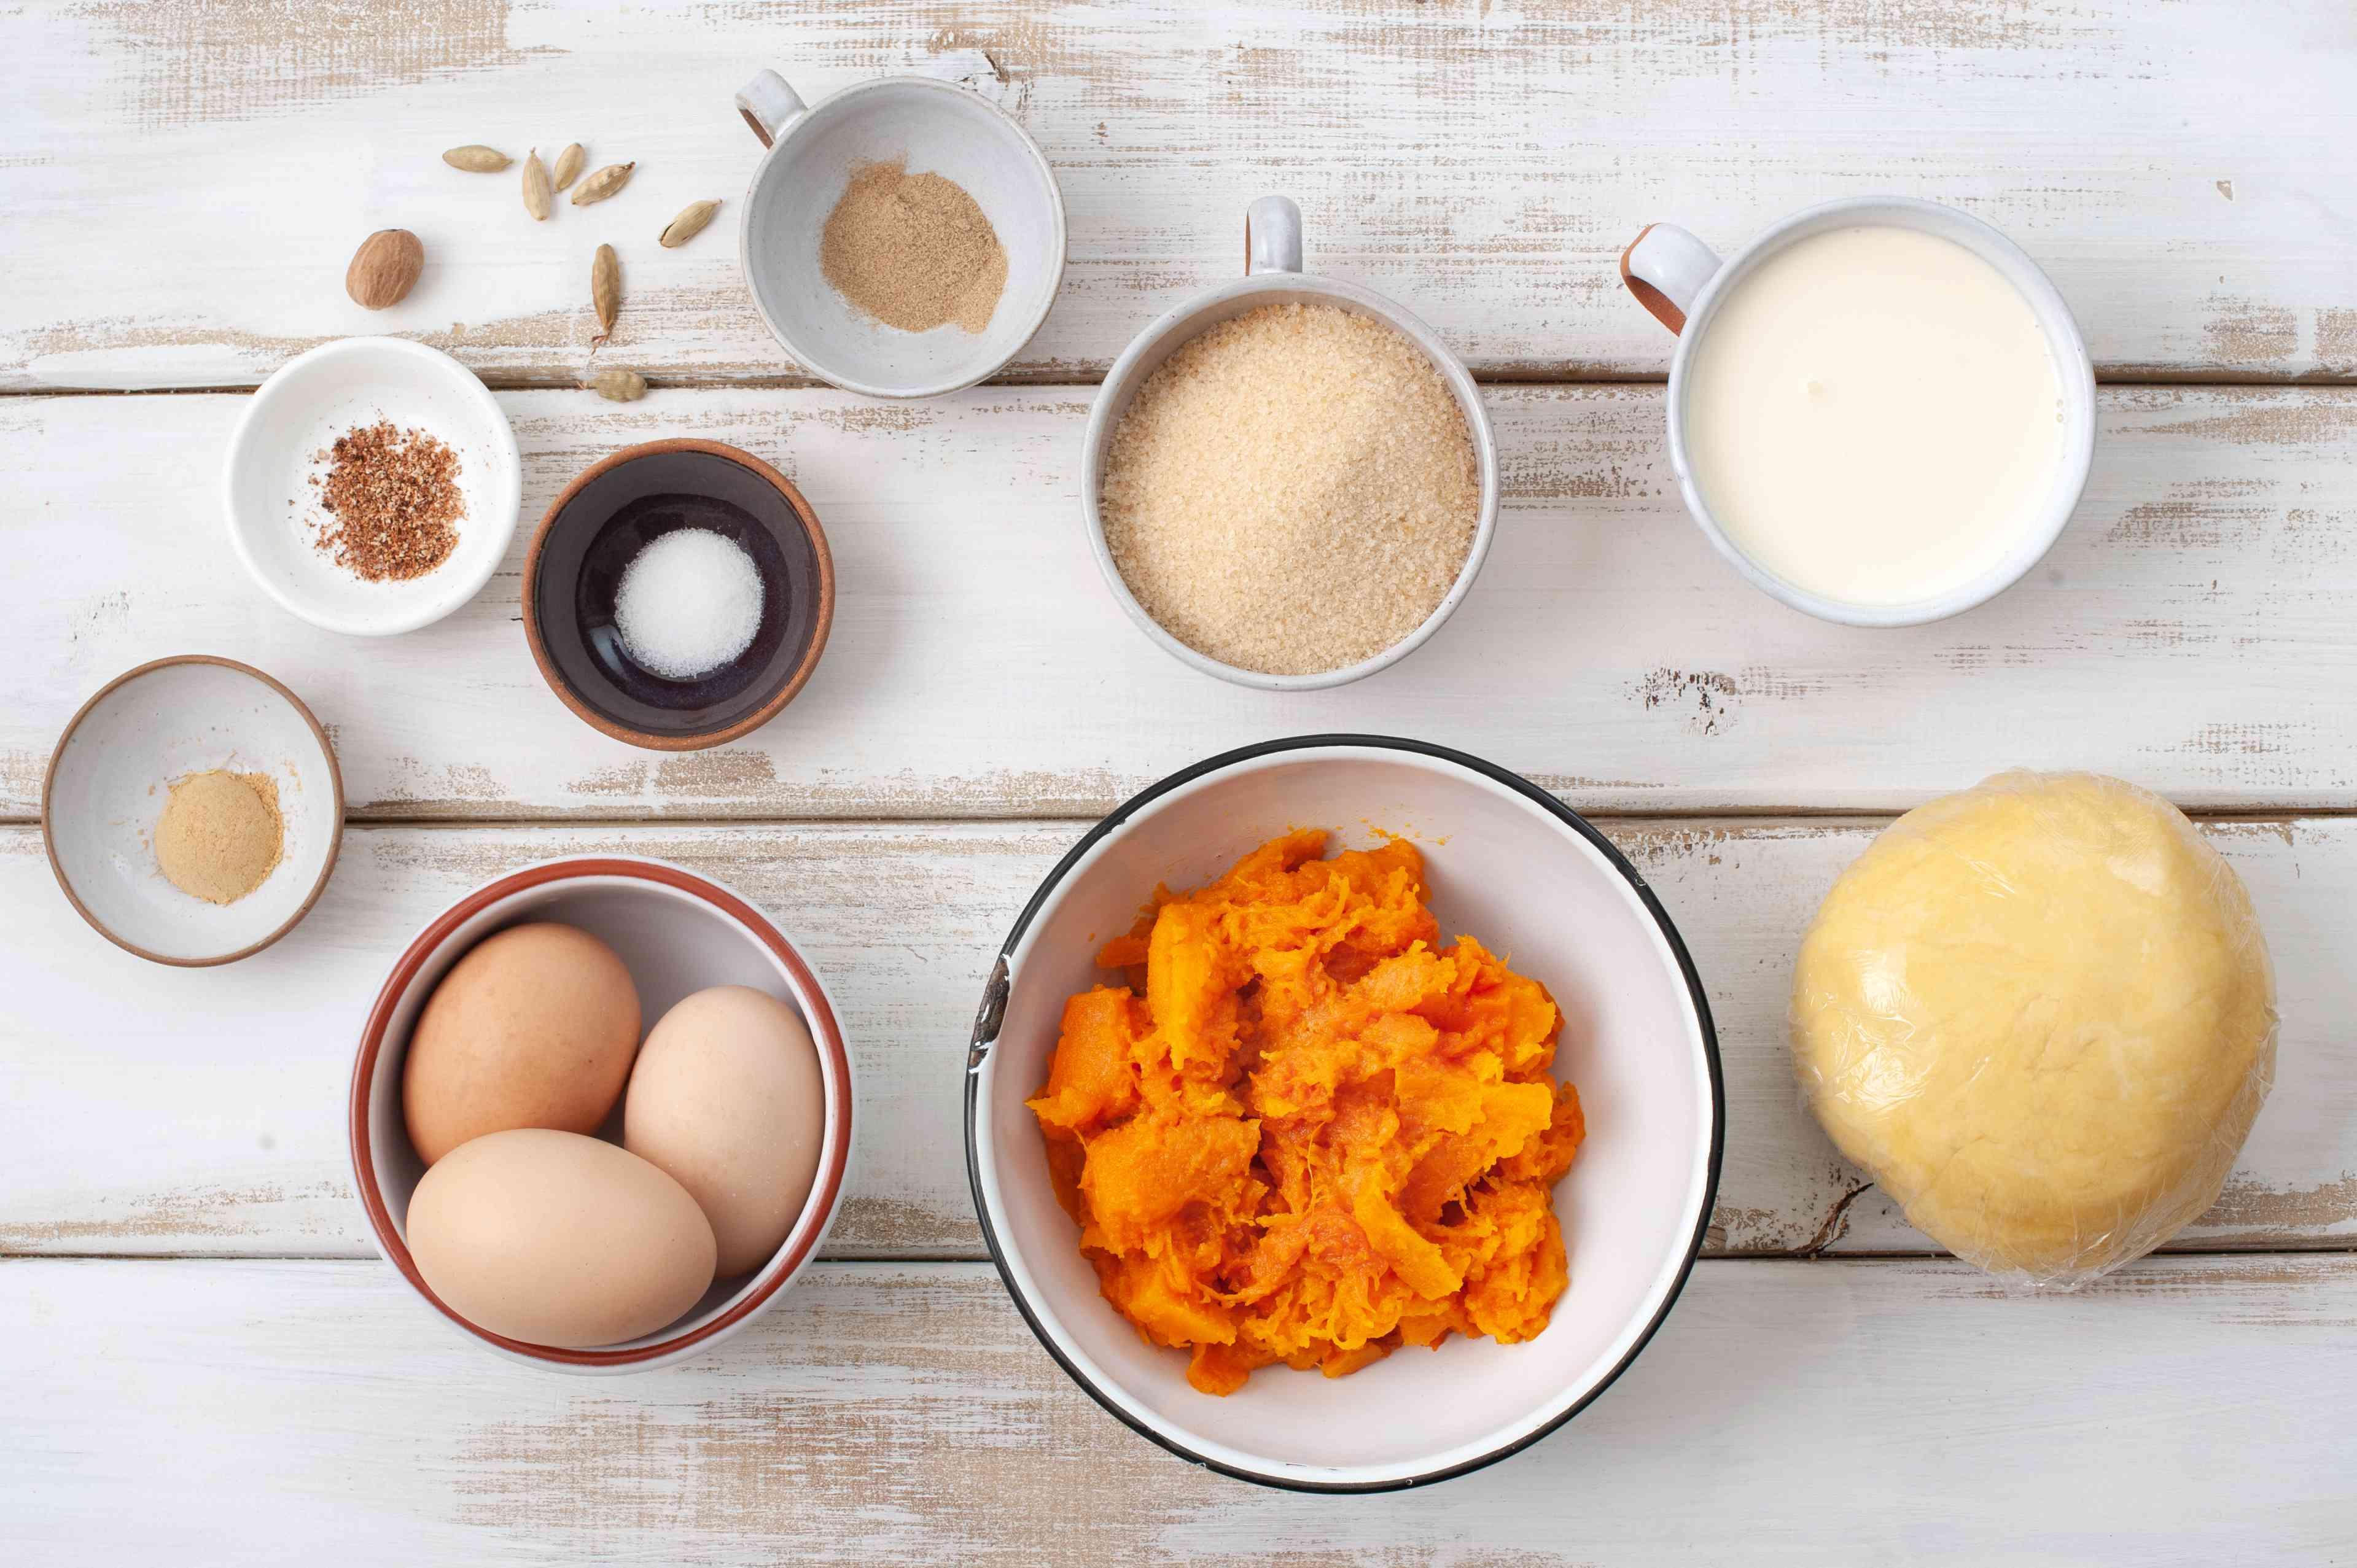 Ingredients for cardamom pumpkin pie